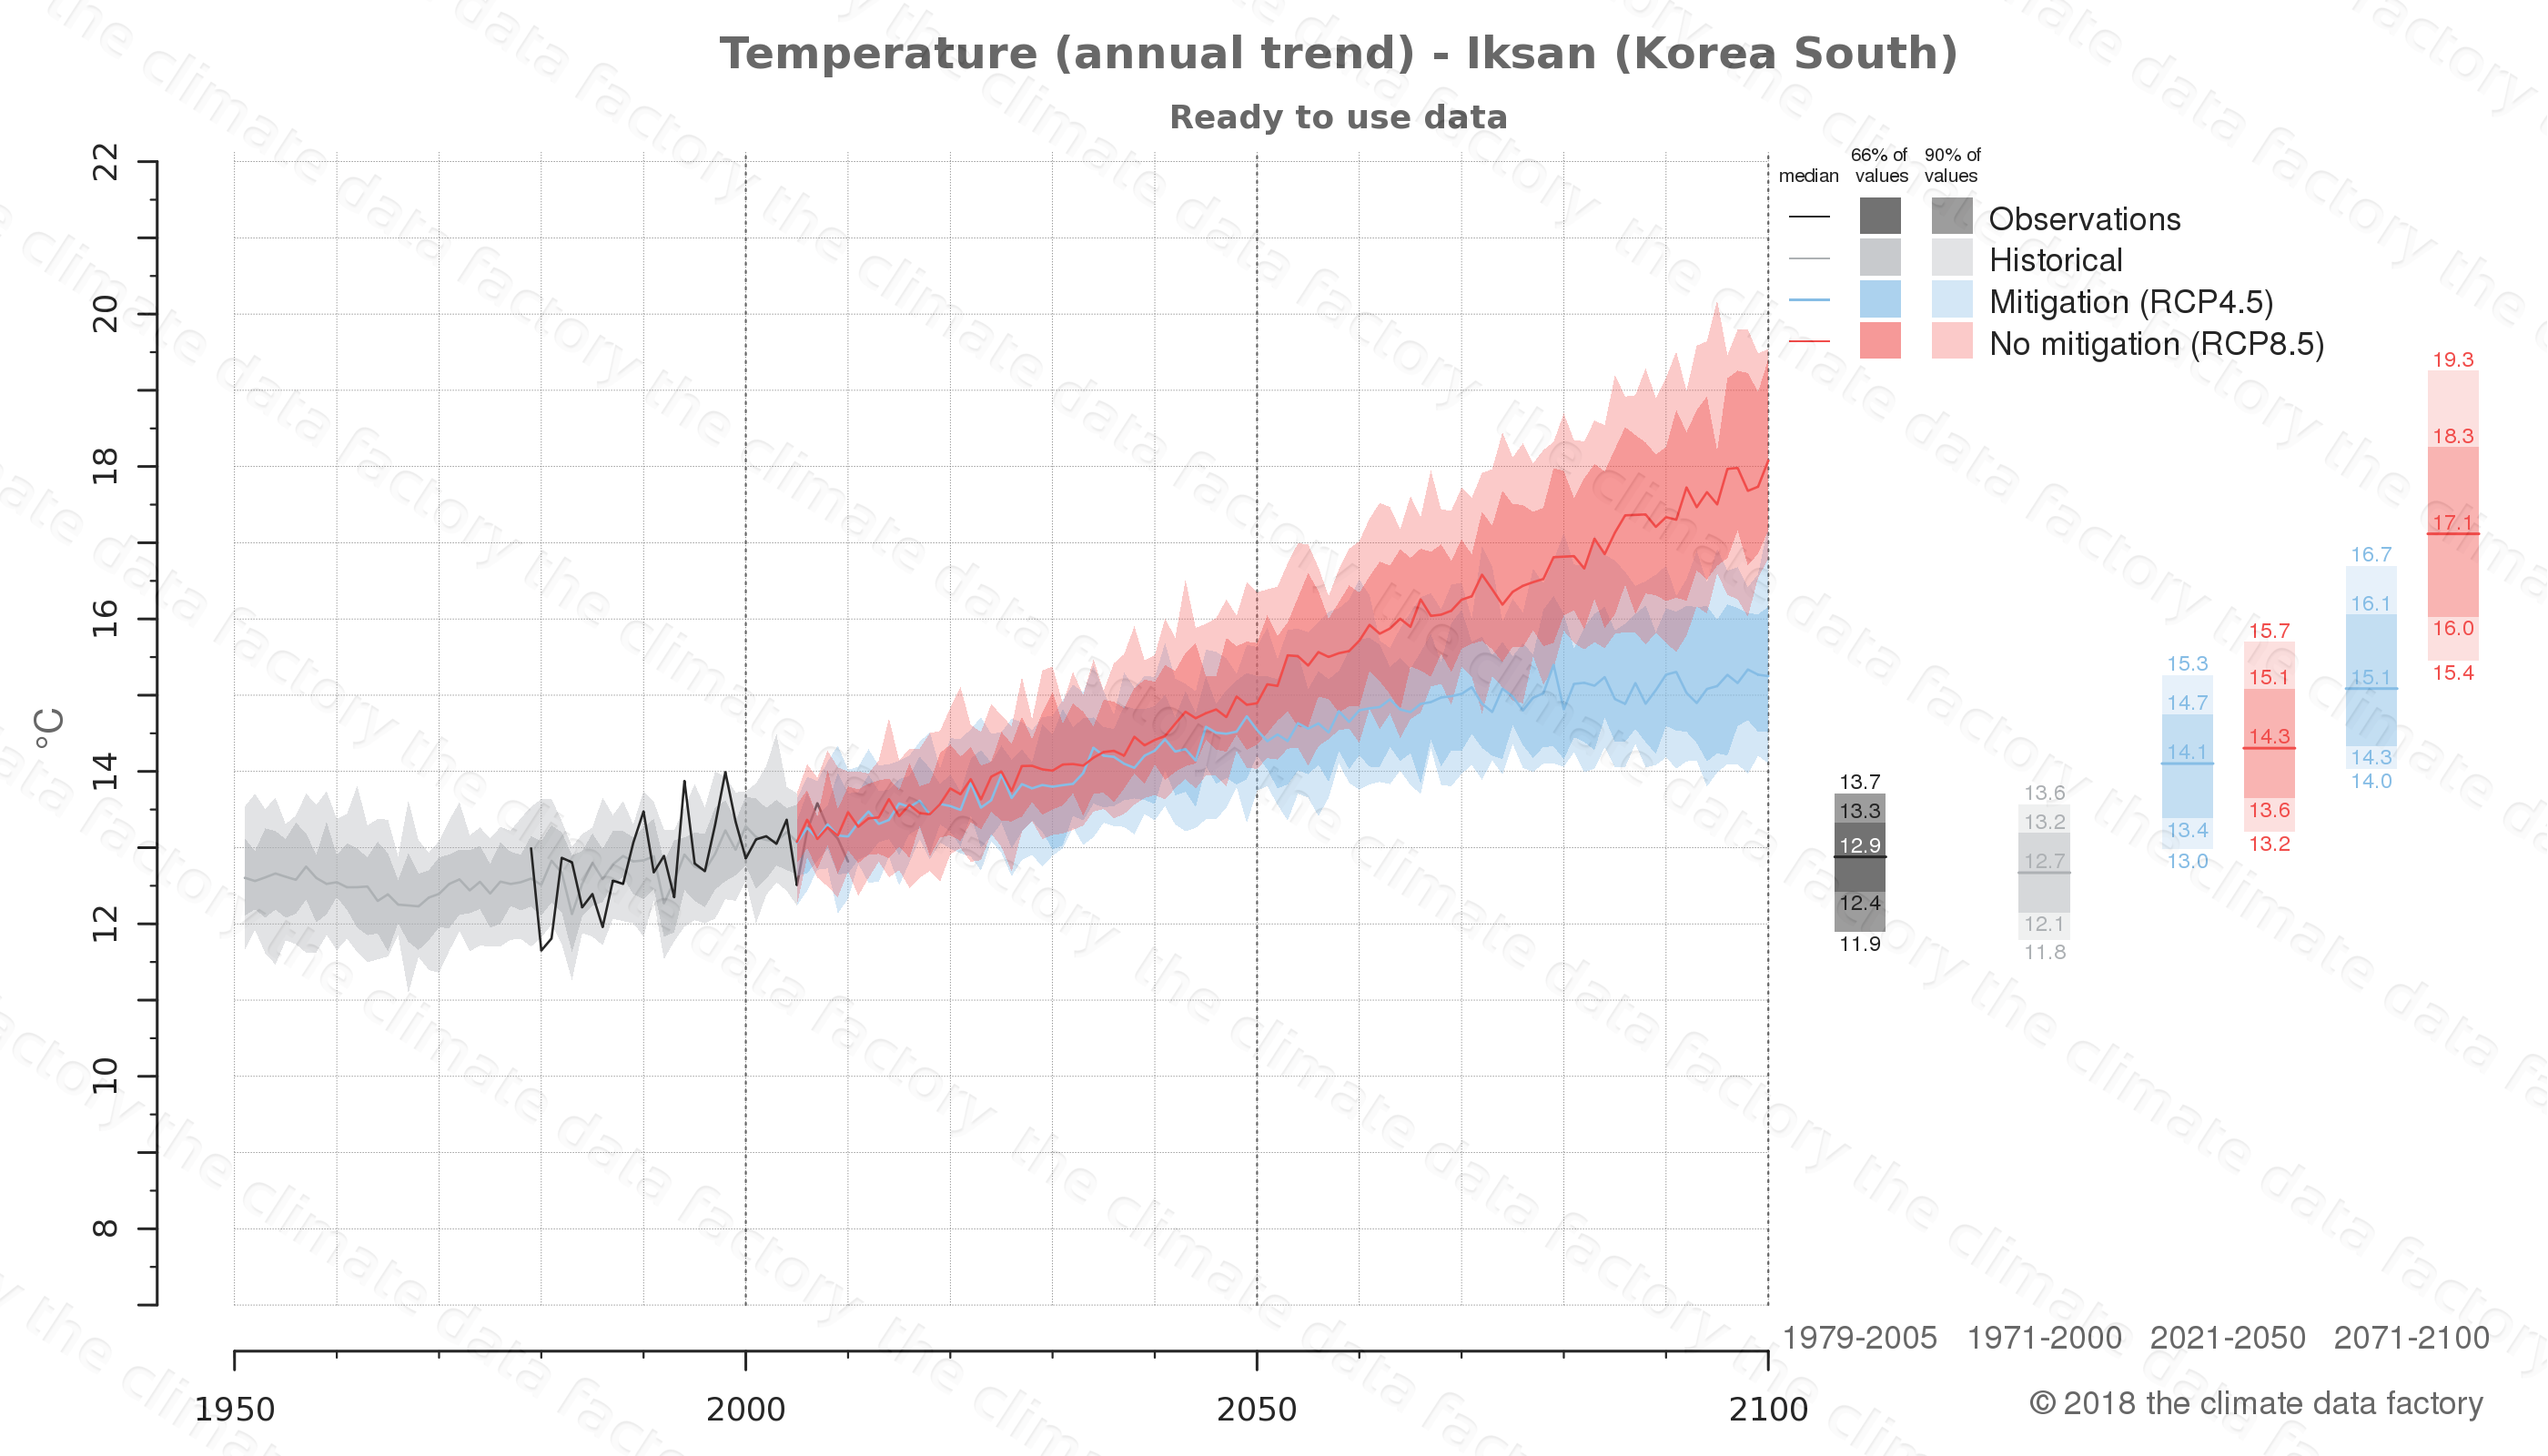 climate change data policy adaptation climate graph city data temperature iksan south korea